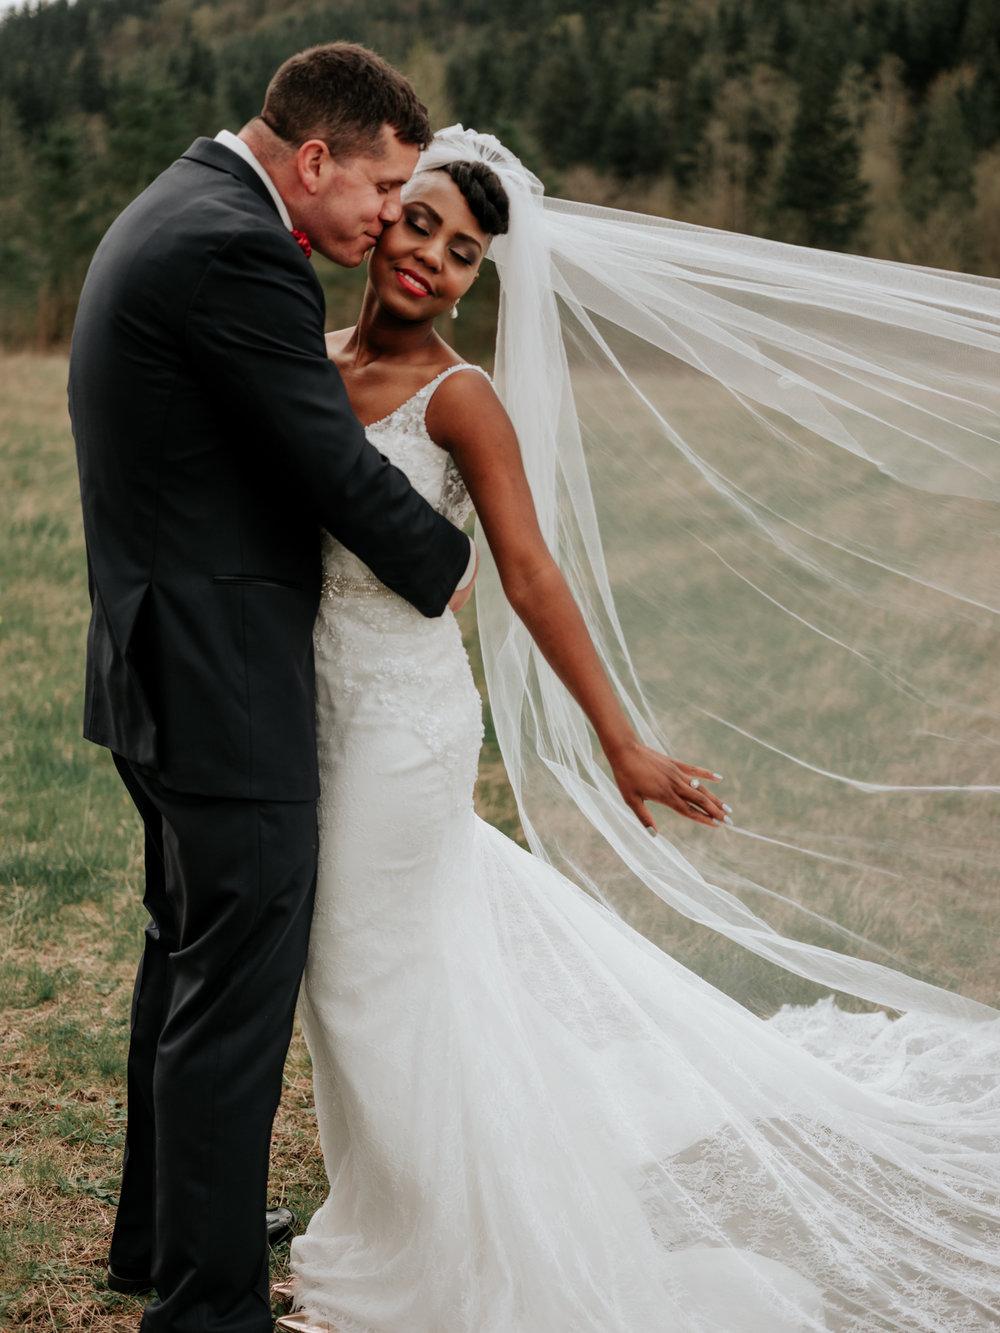 Stolen Glimpses Seattle Wedding Photographer at Rein Fire Ranch 30.jpg